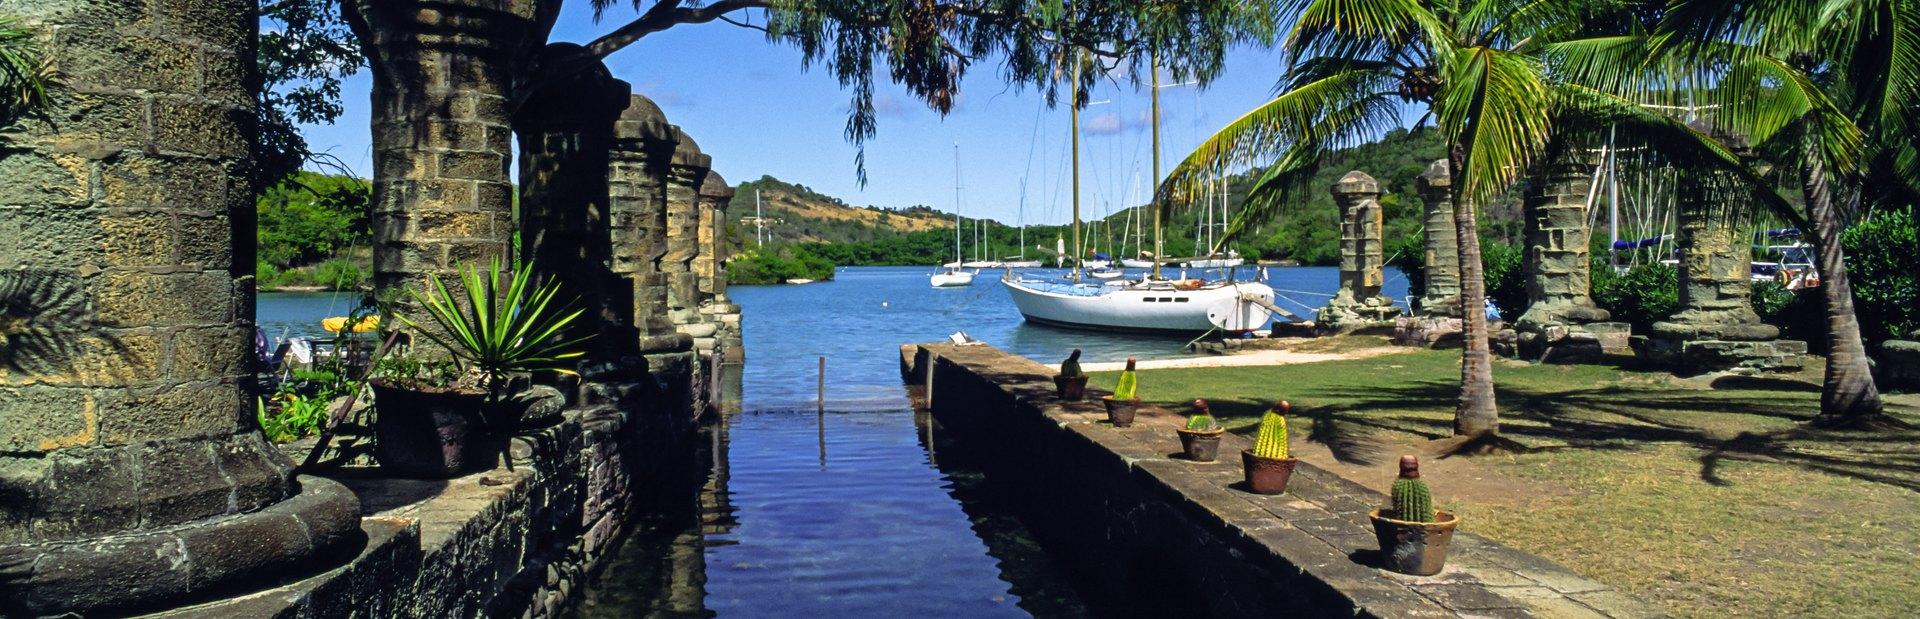 Nelson's Dockyard Image 1